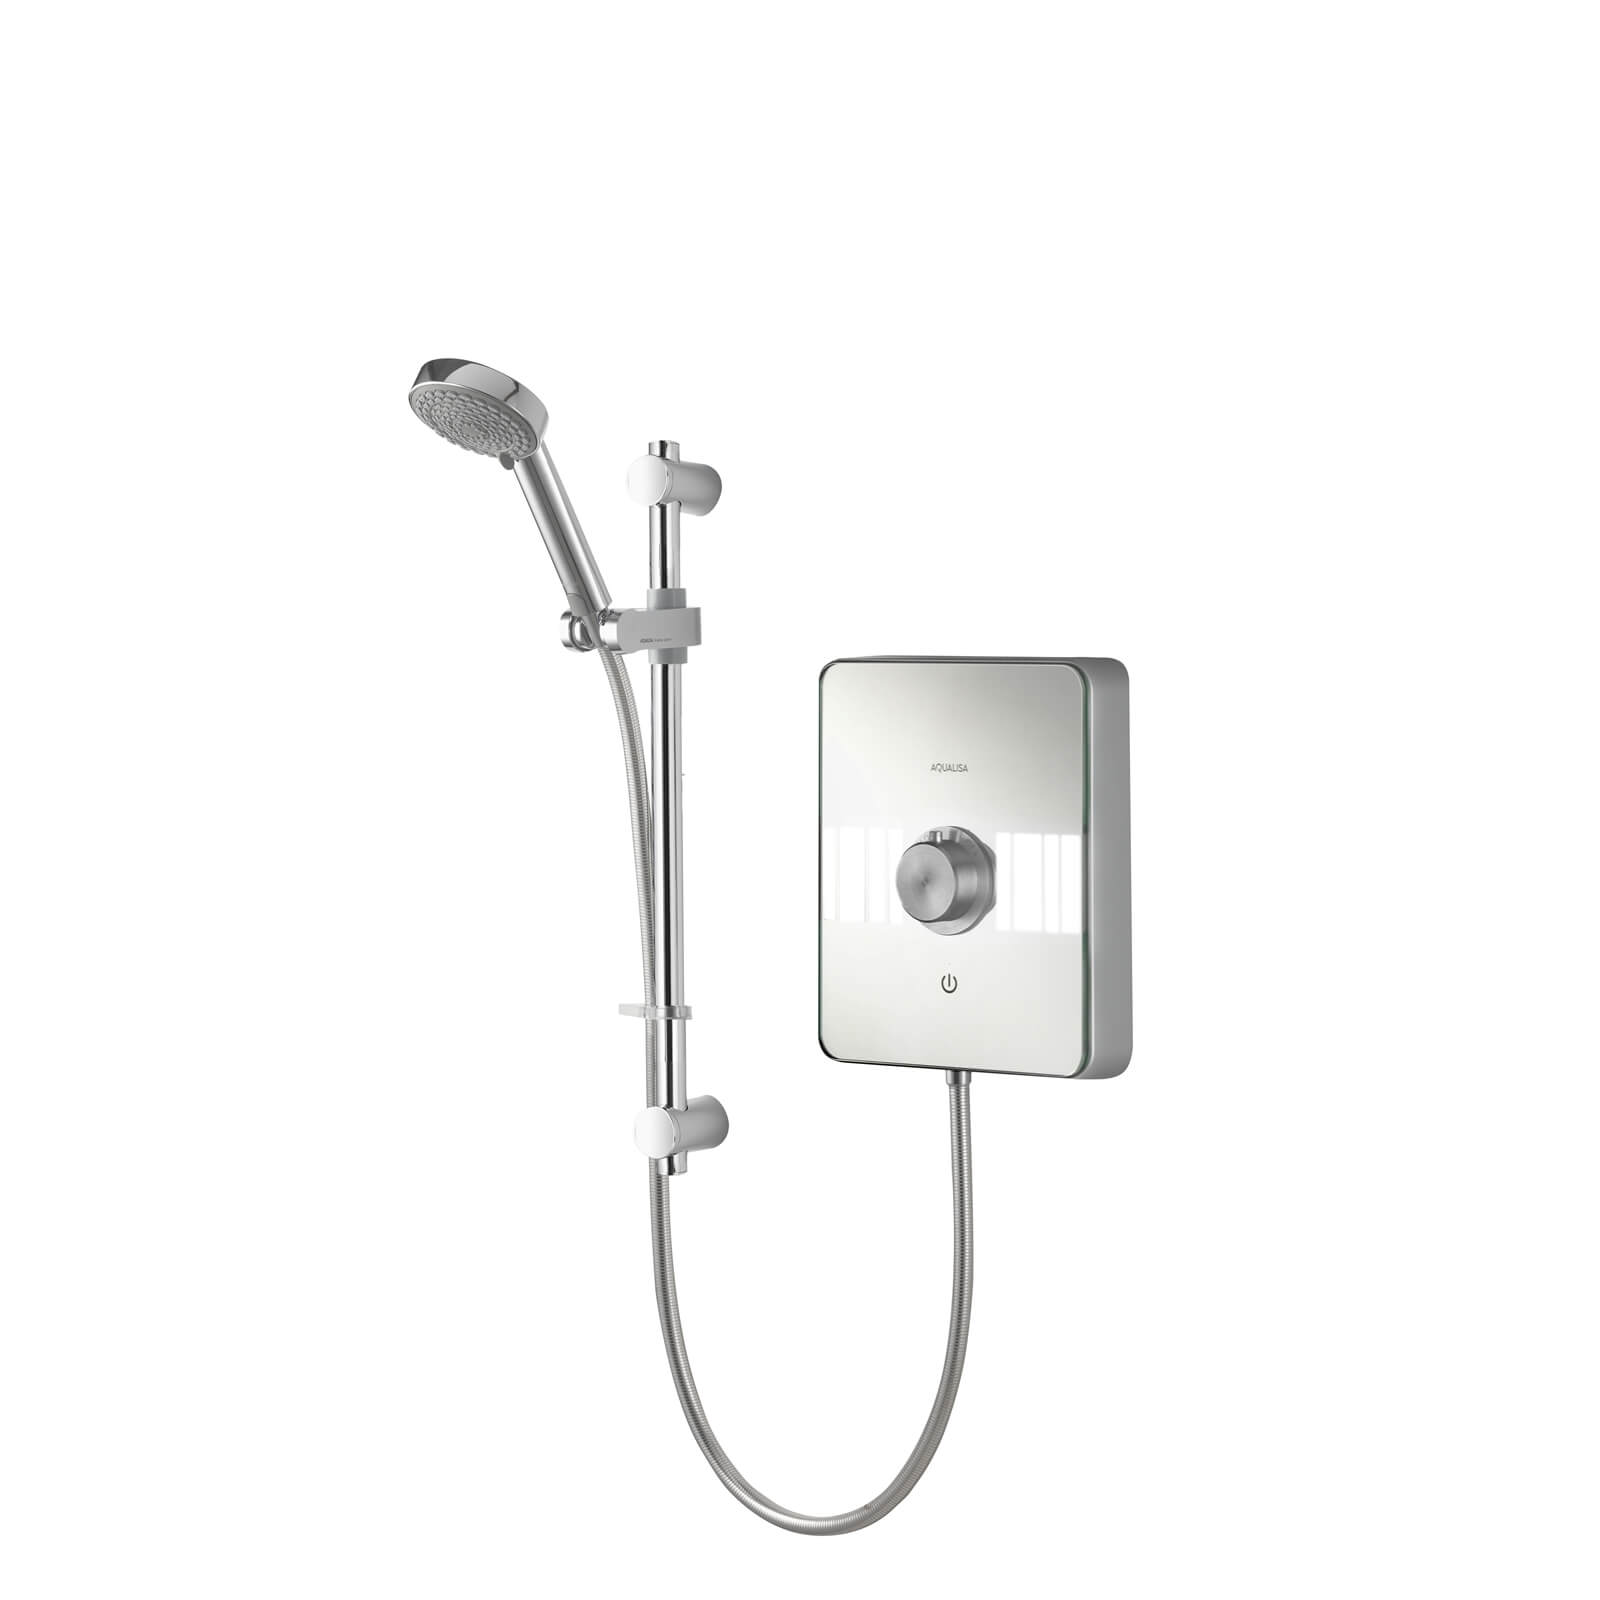 Aqualisa Lumi 9.5kW Electric Shower - Chrome